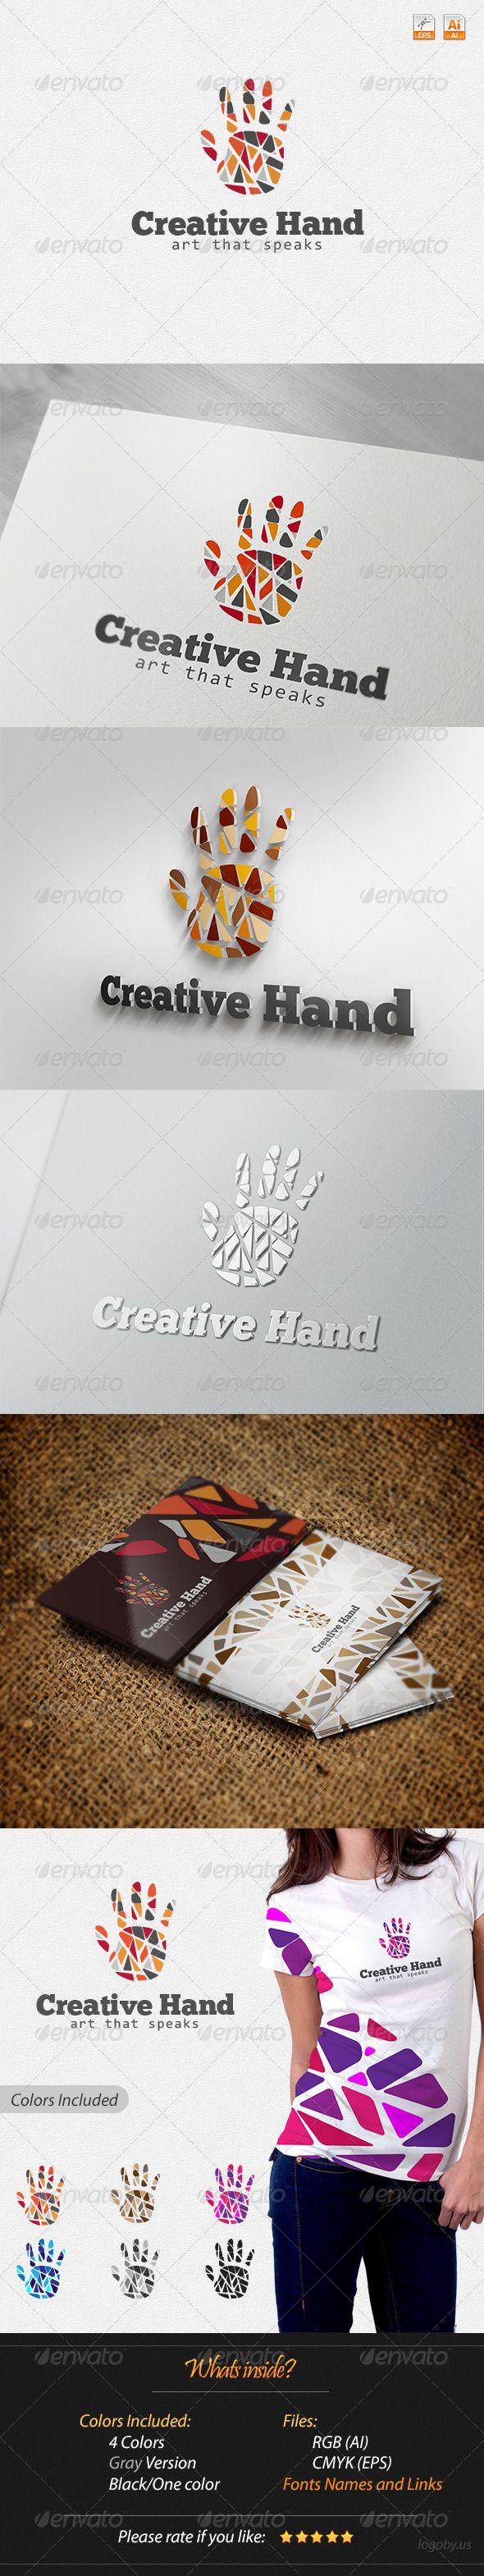 Creative Hand - Art that Speaks Logo                                                                                                                                                                                 More